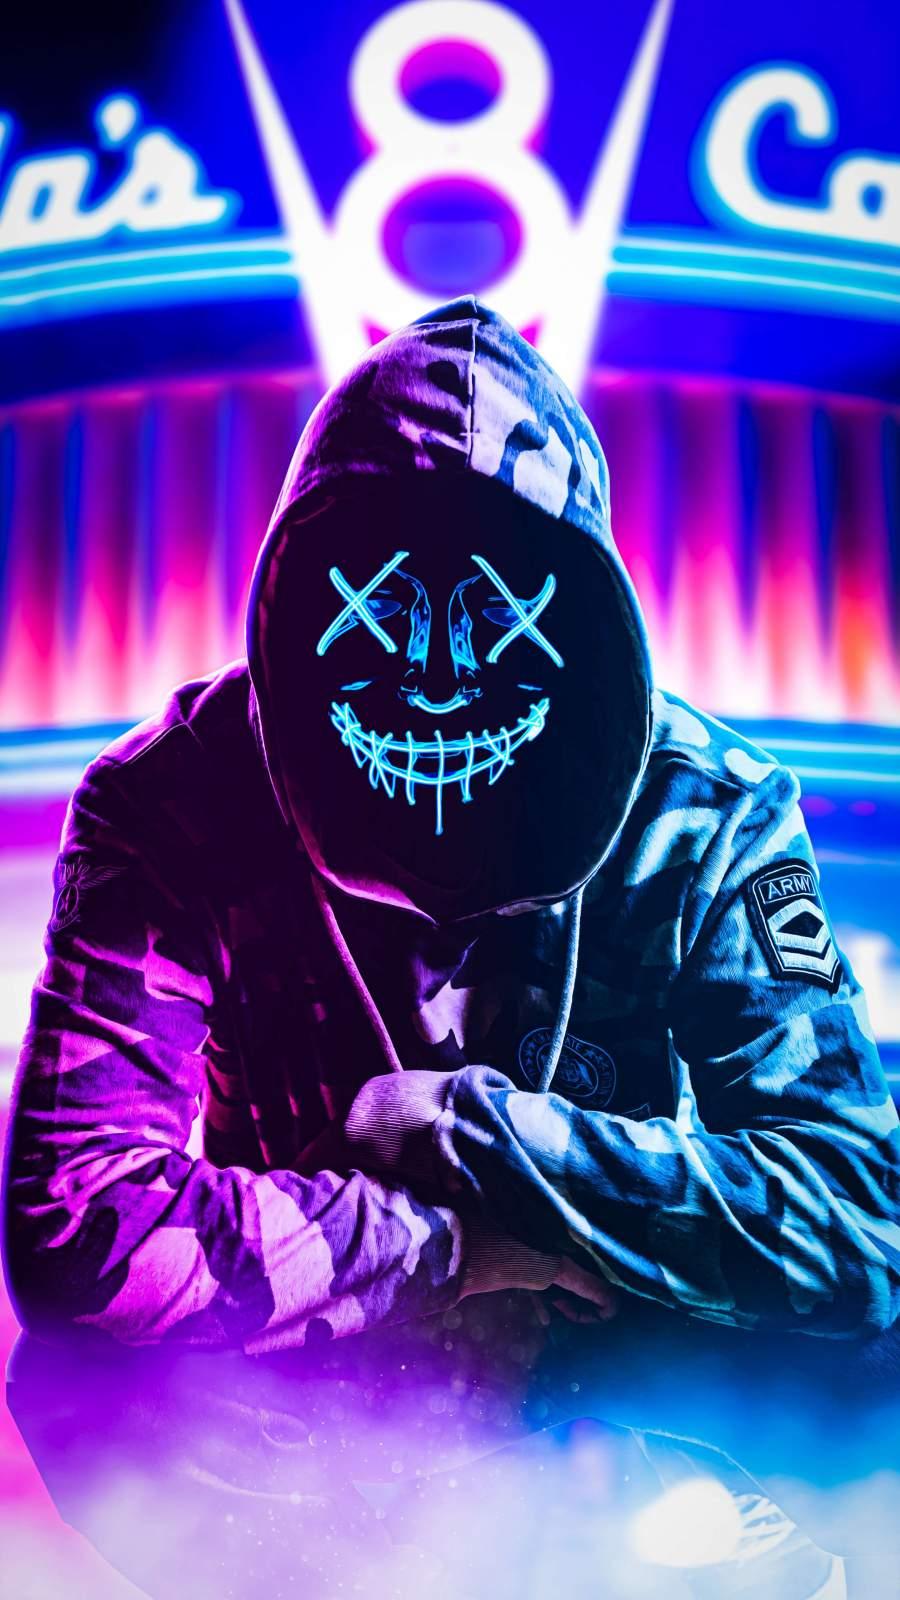 Neon Hoodie Mask iPhone Wallpaper